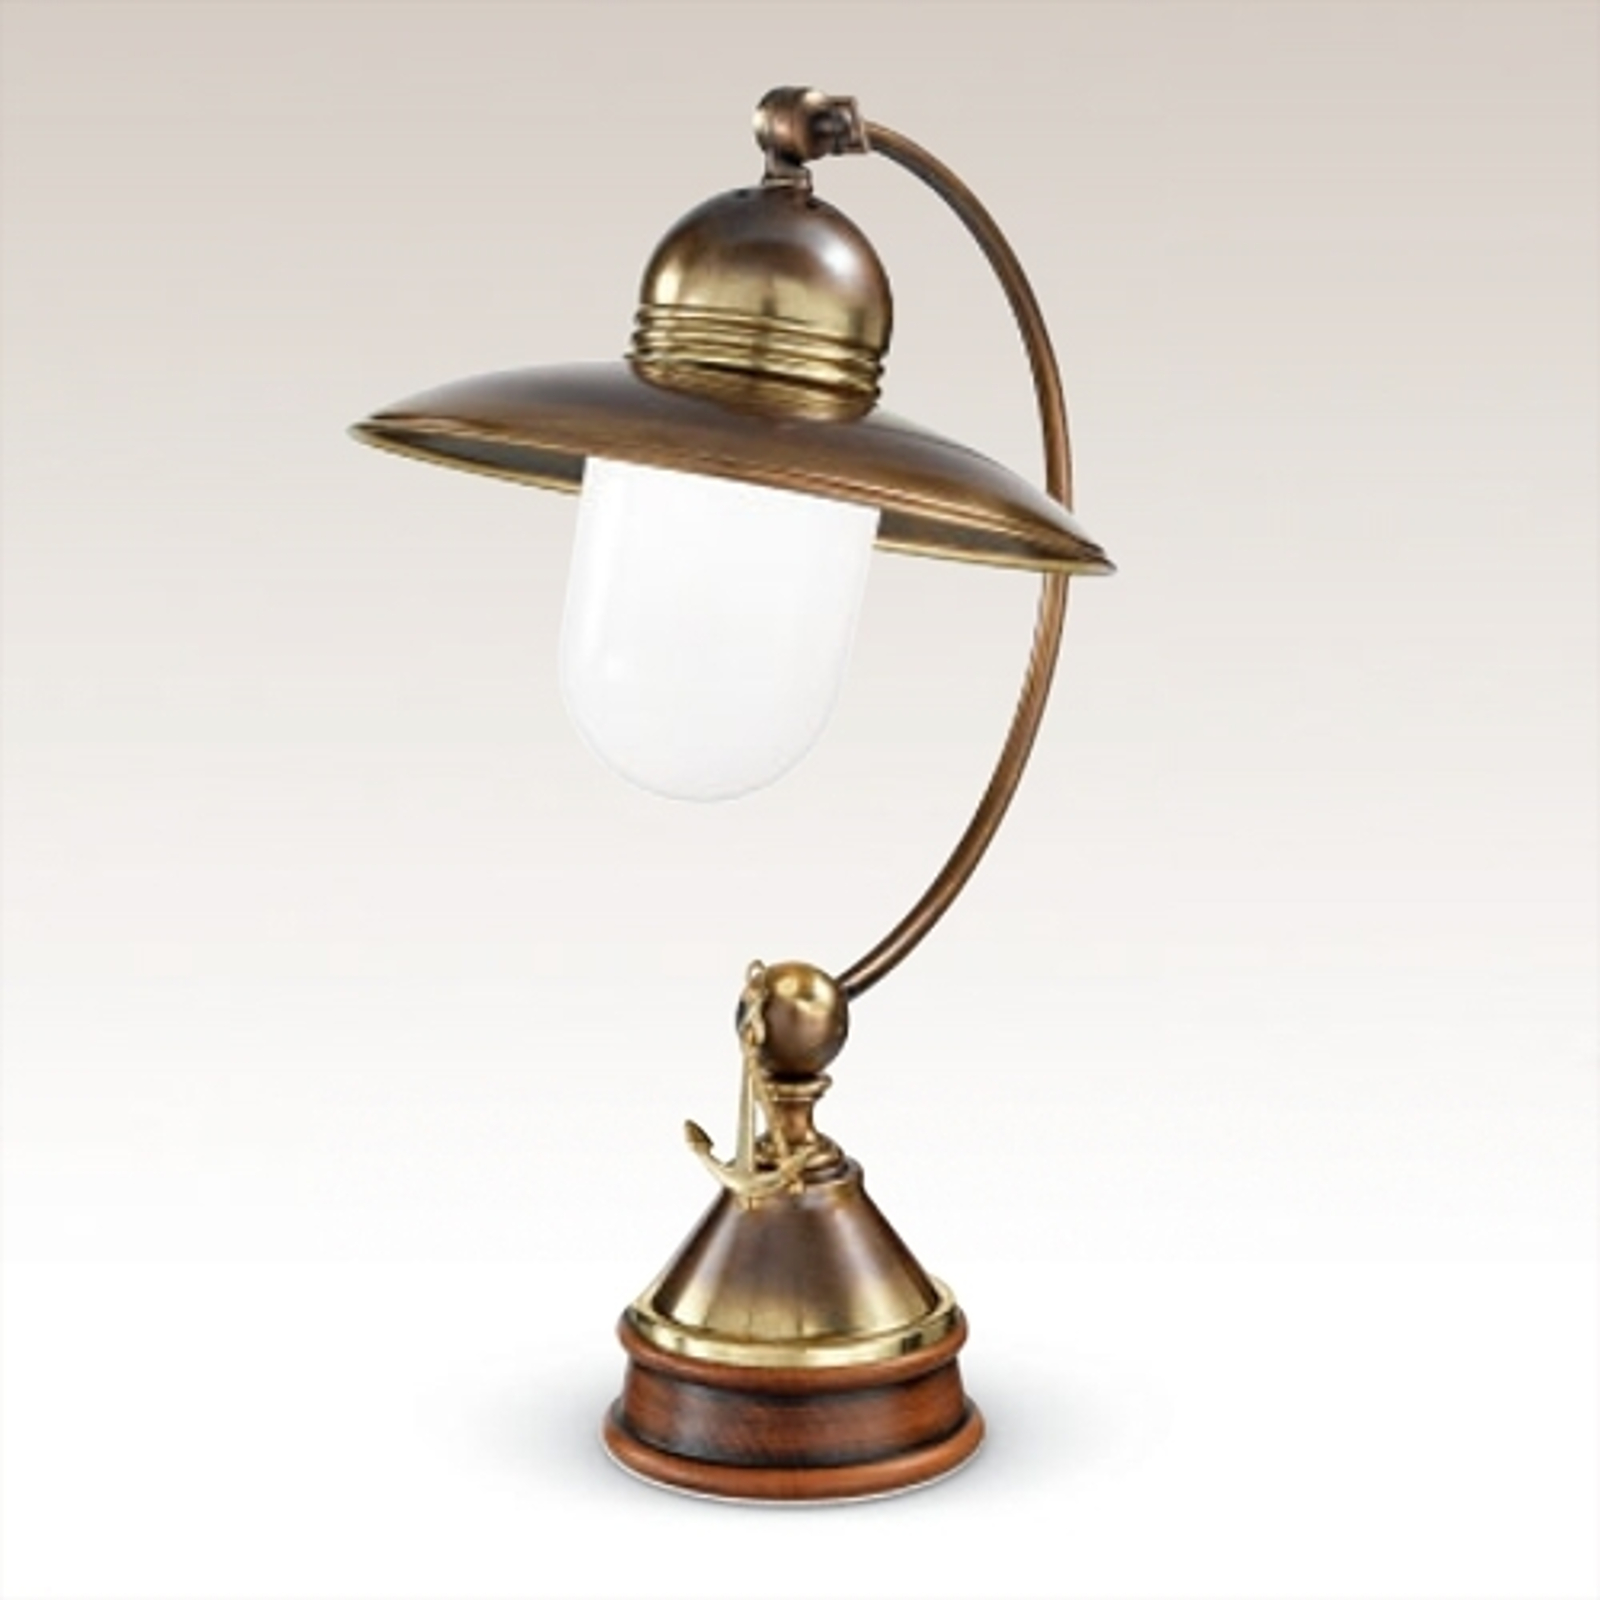 Chutná stolná lampa Faro_2008088_1